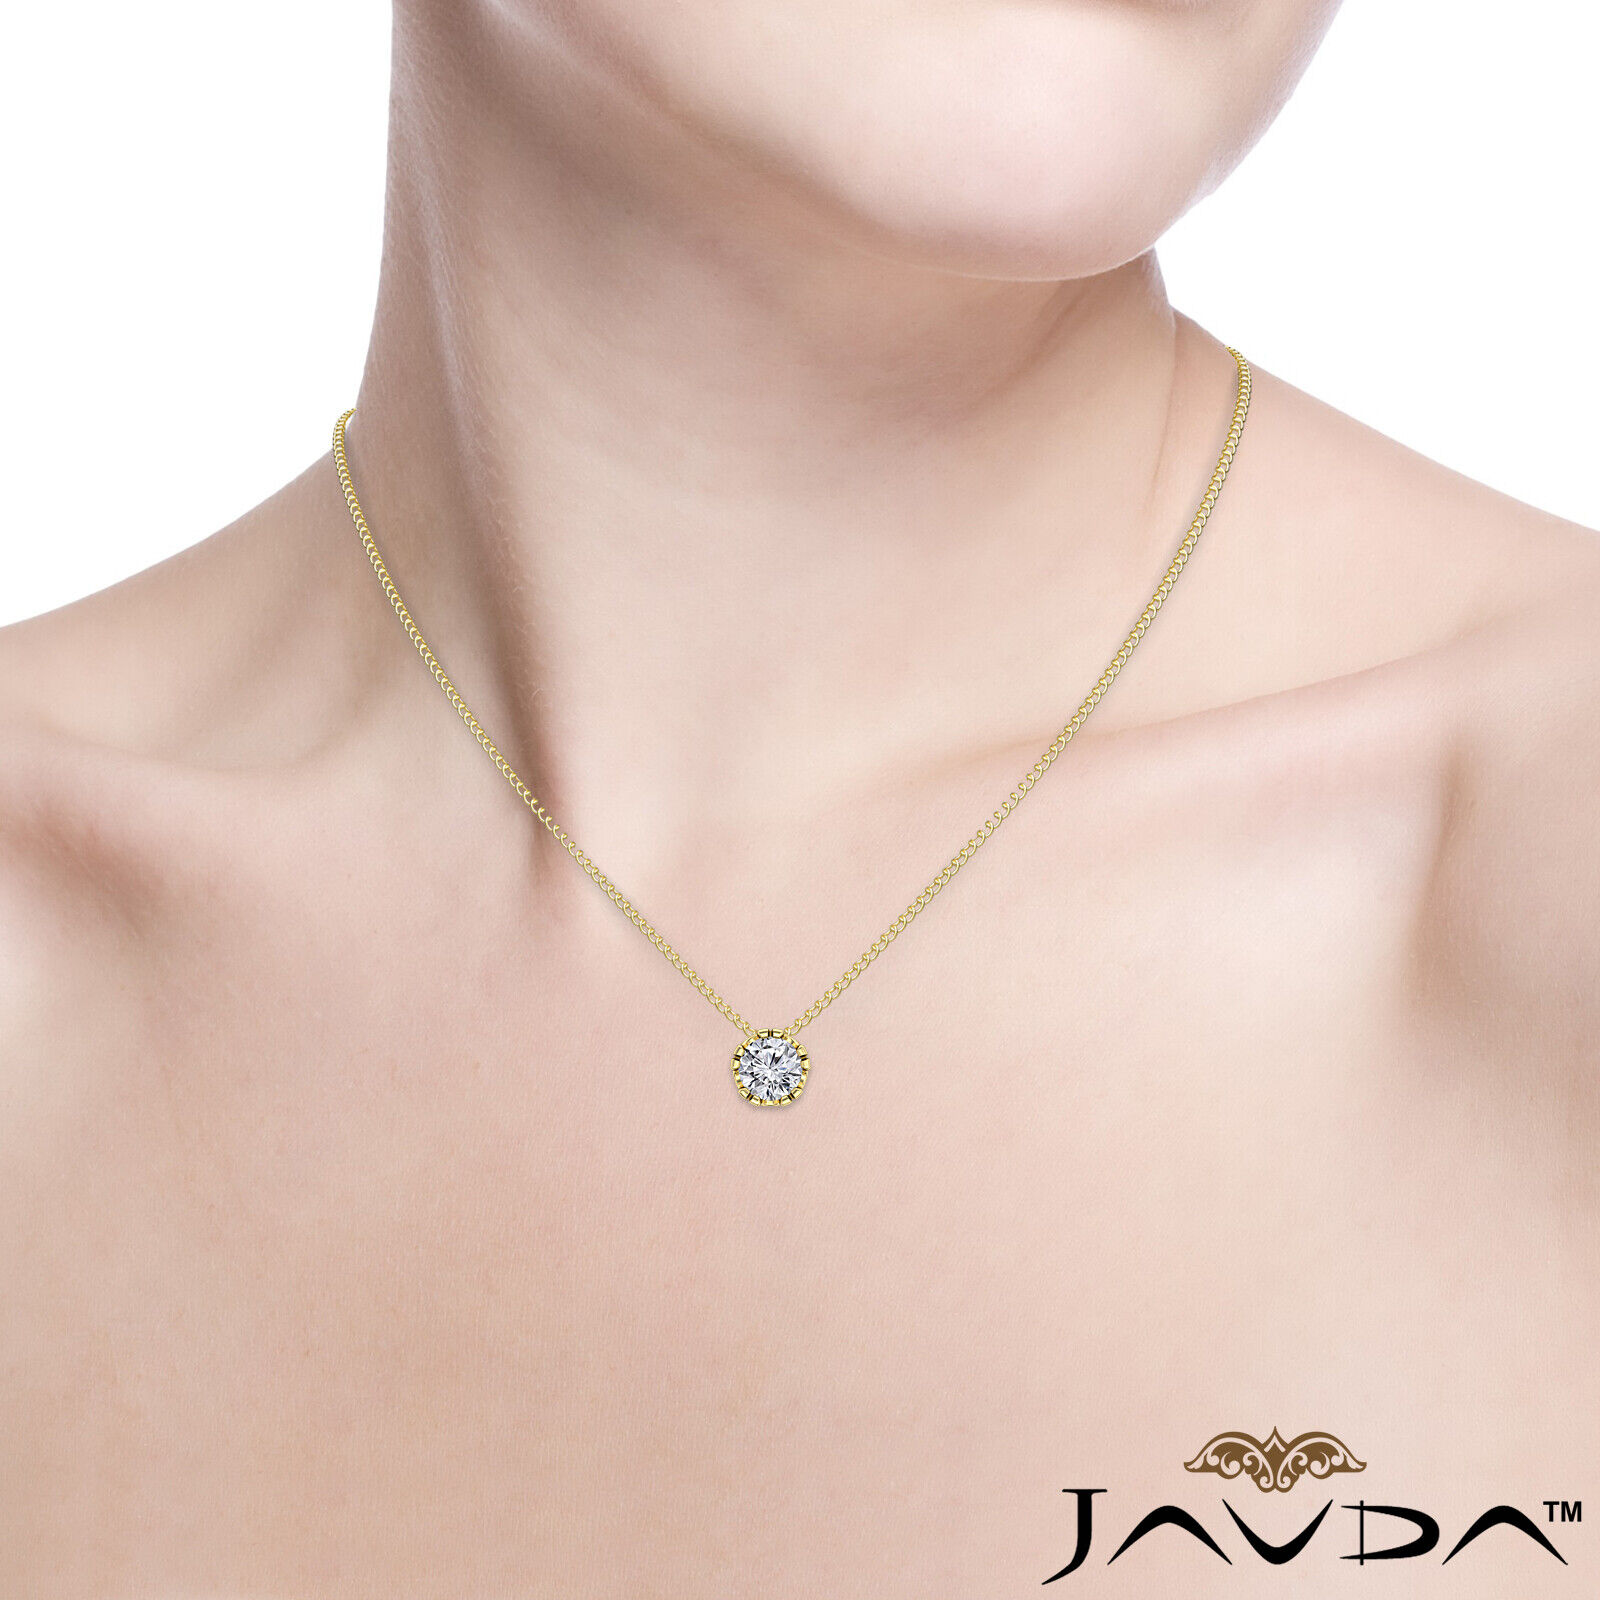 Solitaire Round Shape Diamond Double Prong Pendant 18 Inch Rolo Chain 0.26 ctw. 7